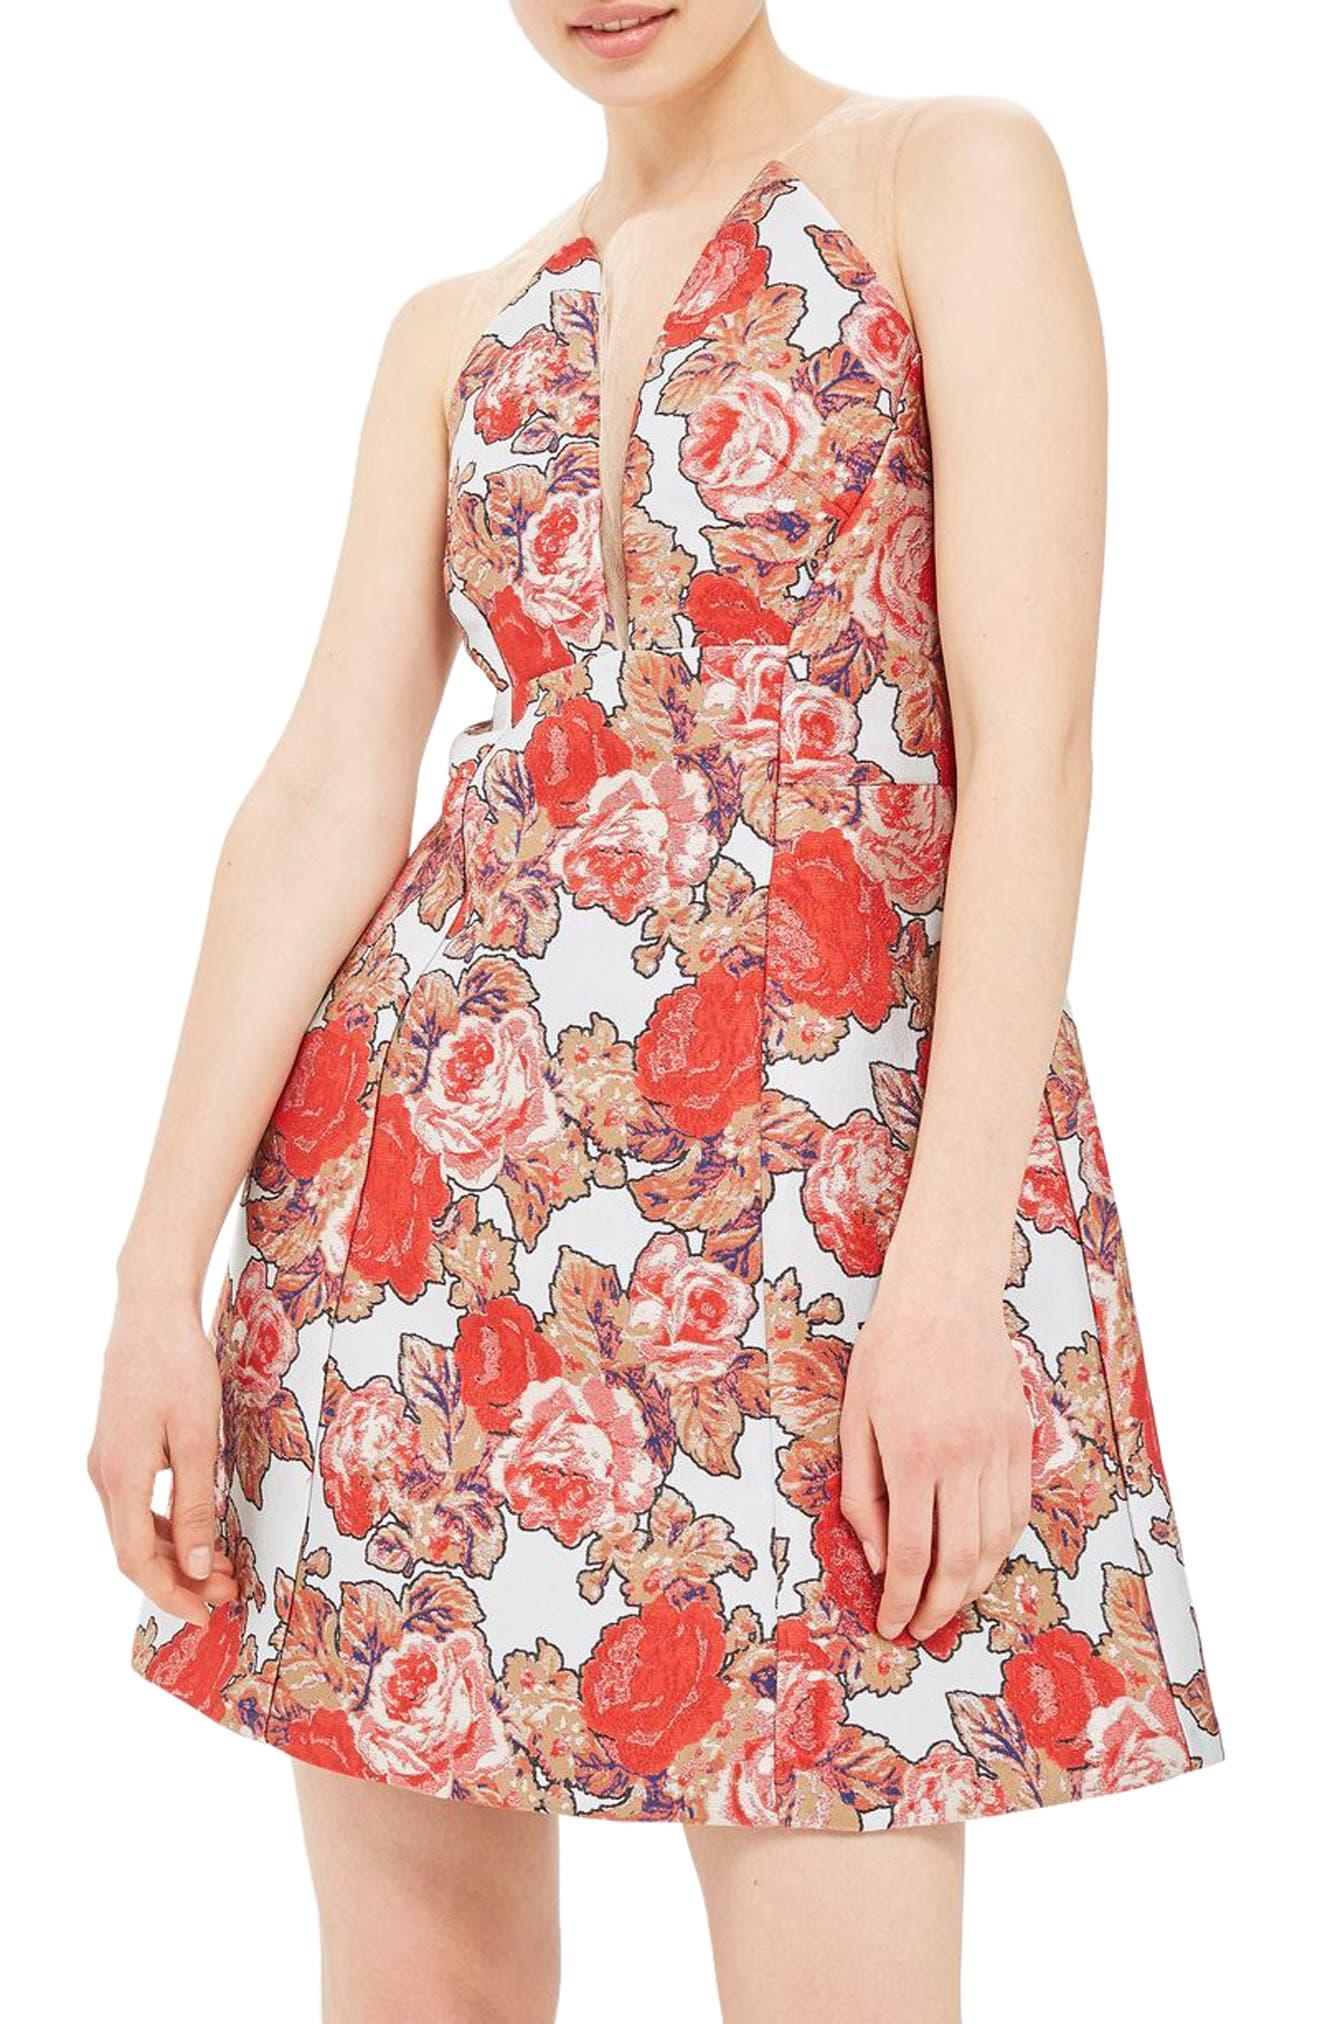 Illusion Jacquard Minidress,                         Main,                         color, Red Multi